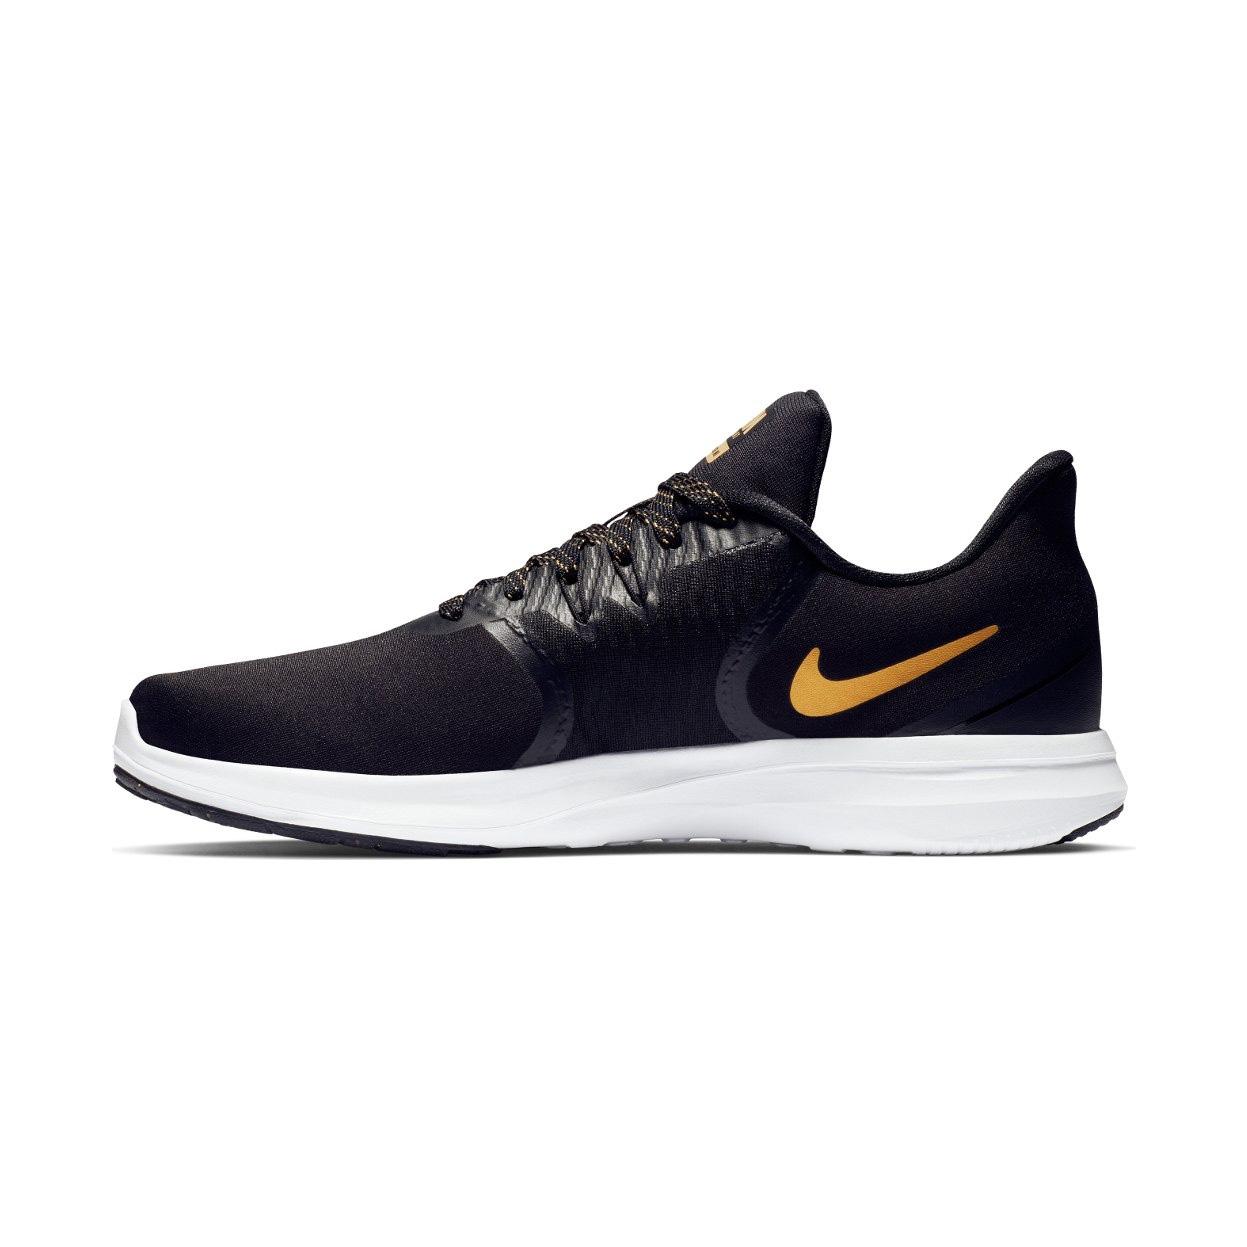 f53c9f5a6417 Nike Women s In-Season TR 8 Print Training Shoes - Black Gold ...